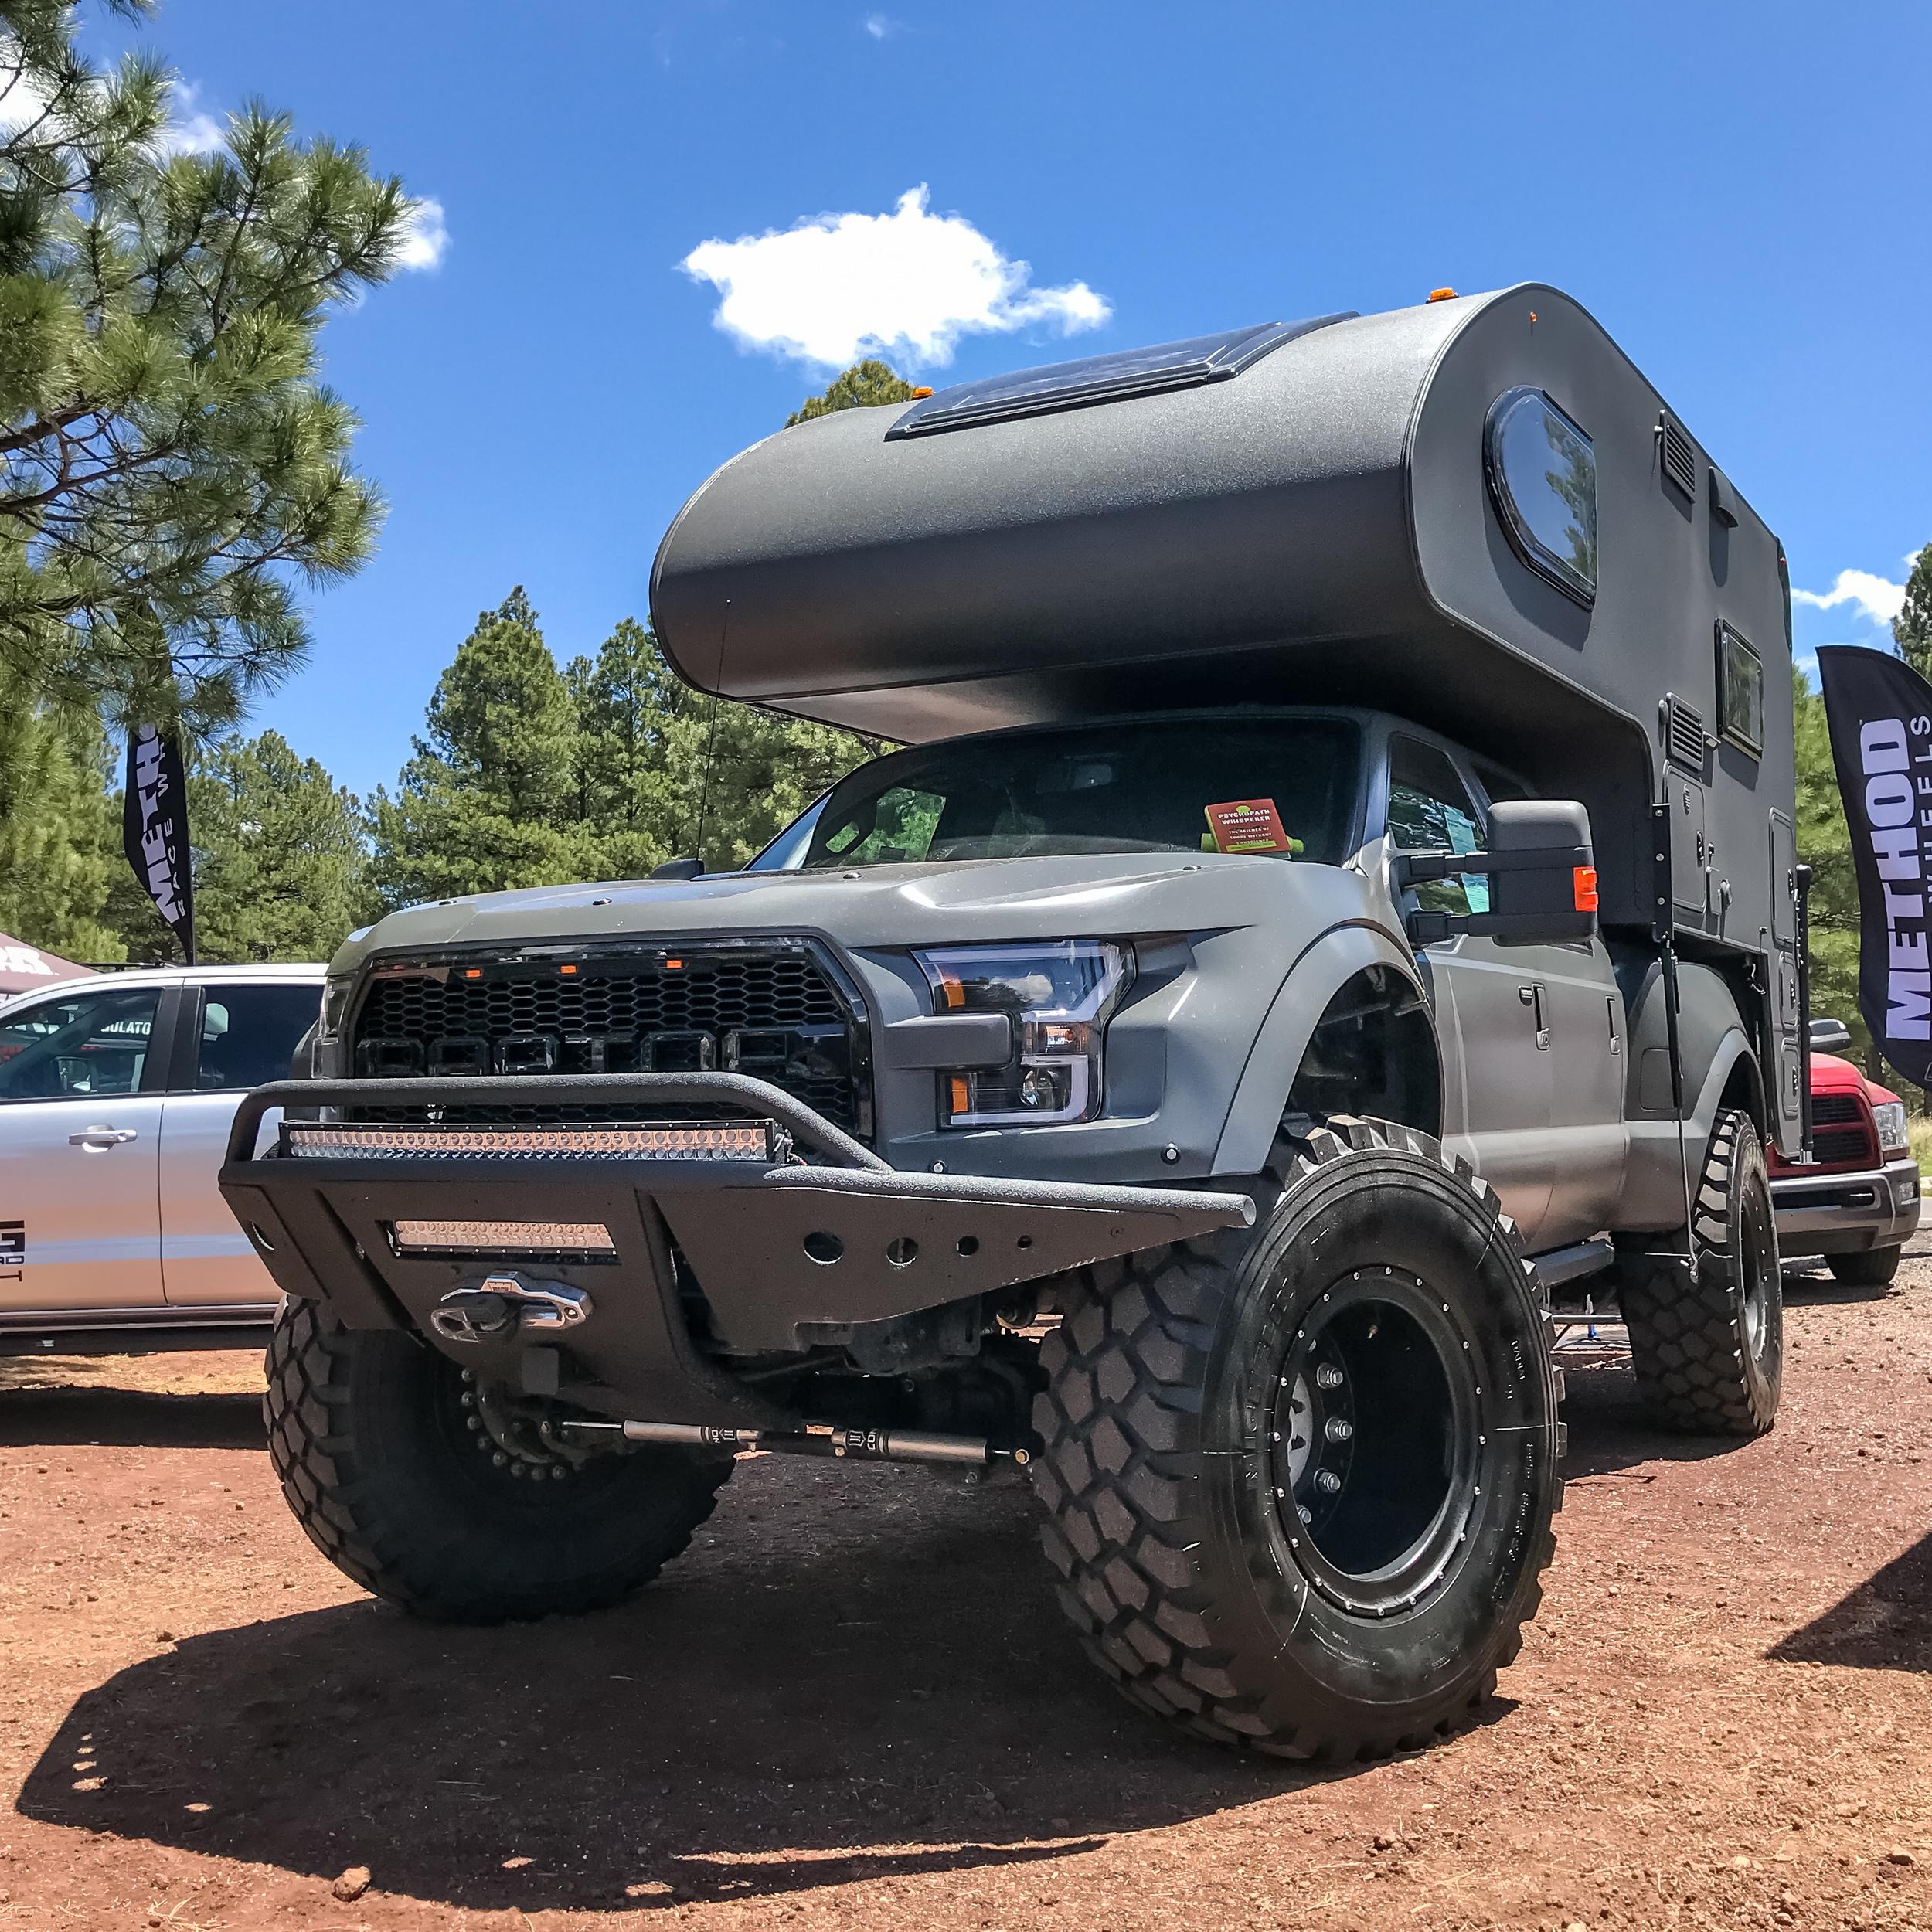 Toyota Tundra Overland Machine Gearjunkie